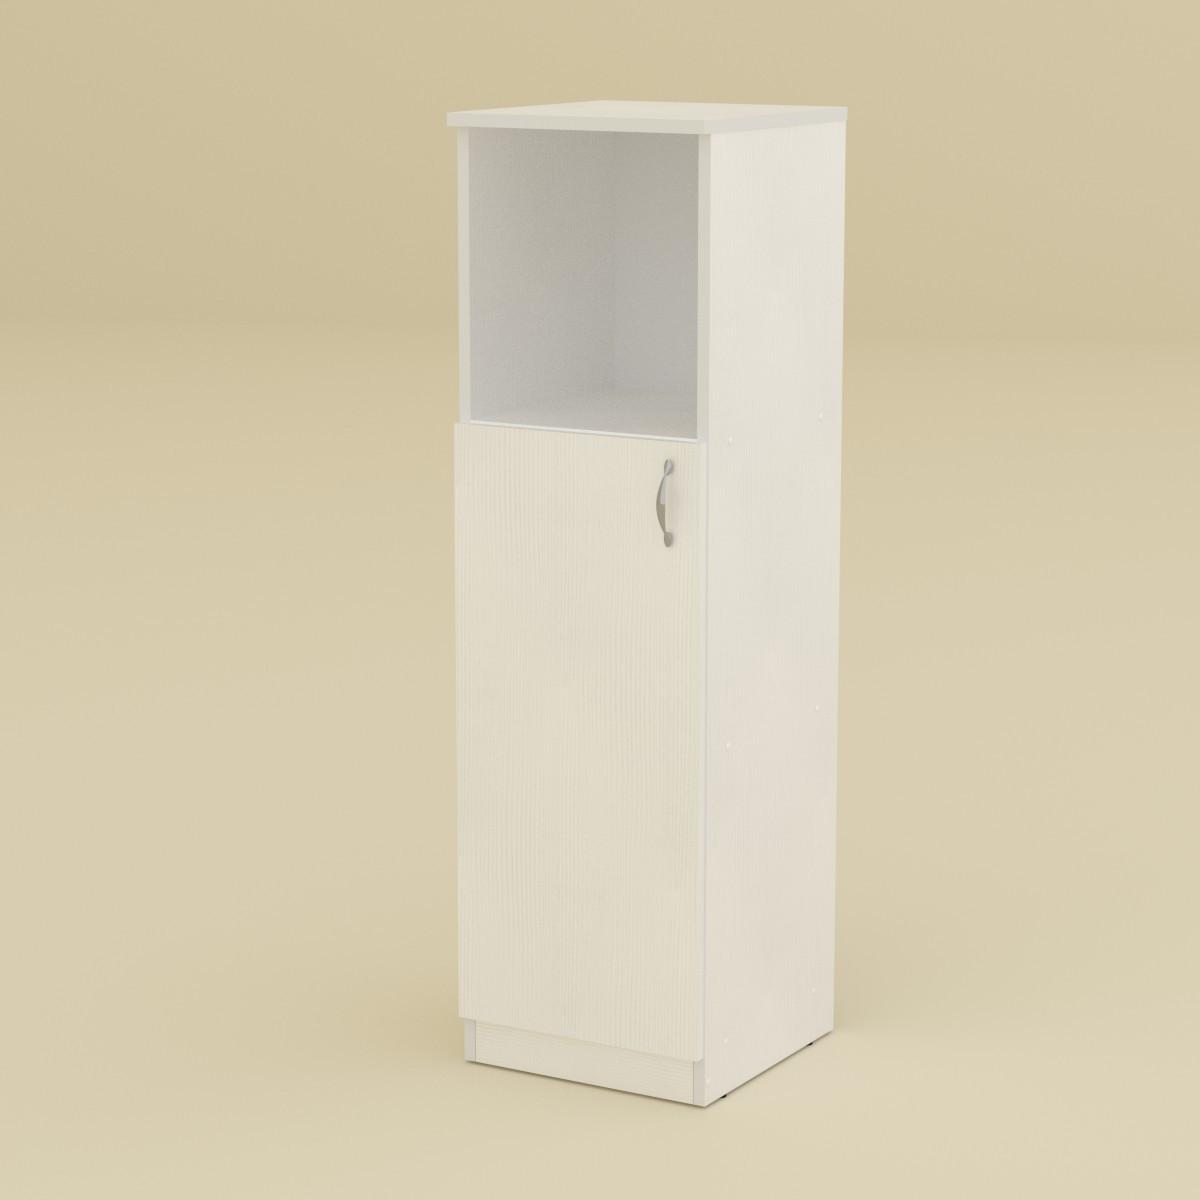 Шкаф книжный КШ-16 белый Компанит (36х37х120 см)